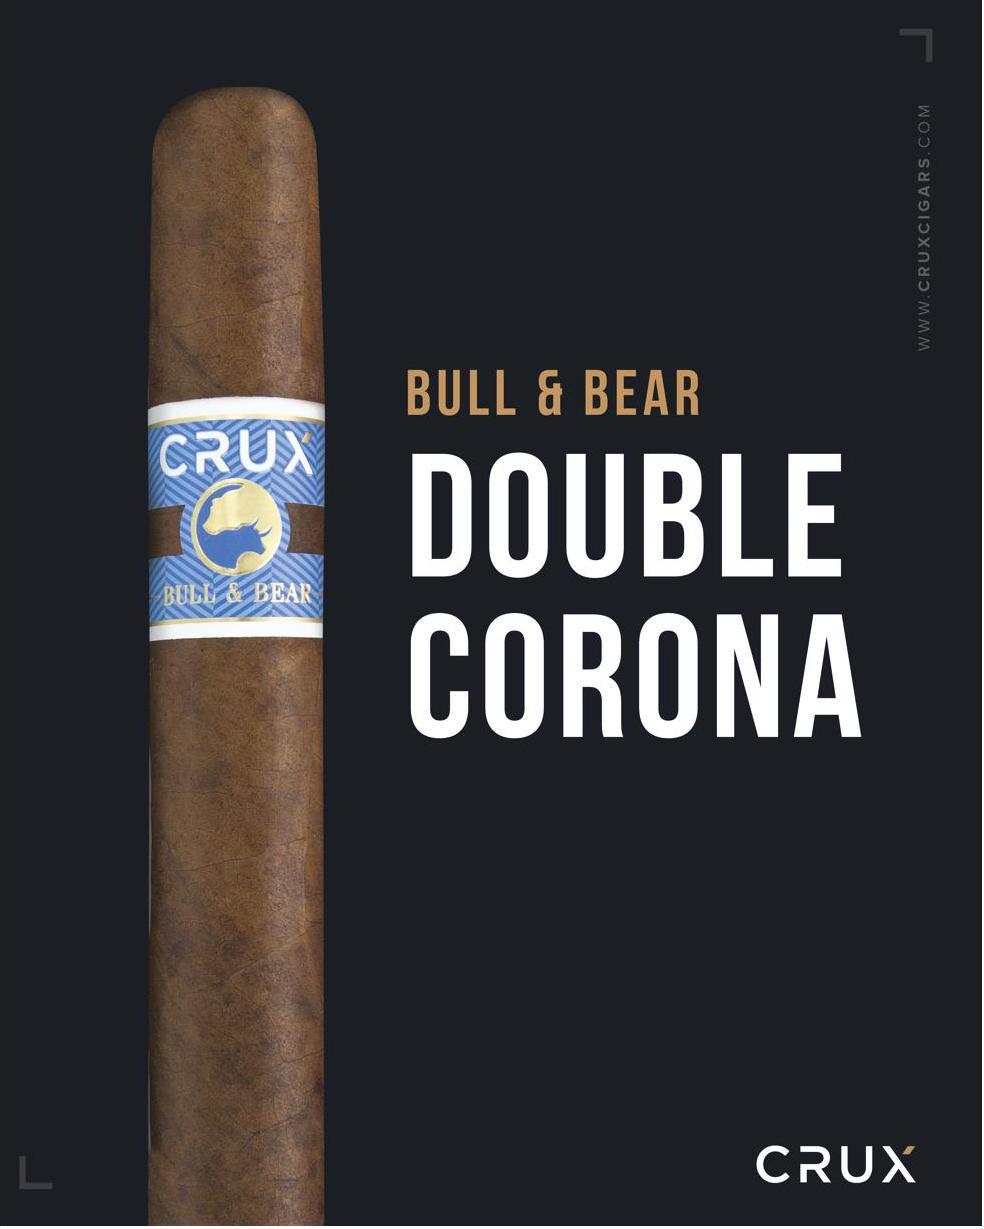 Cigar News: Crux Bull & Bear Double Corona to Launch at PCA 2021